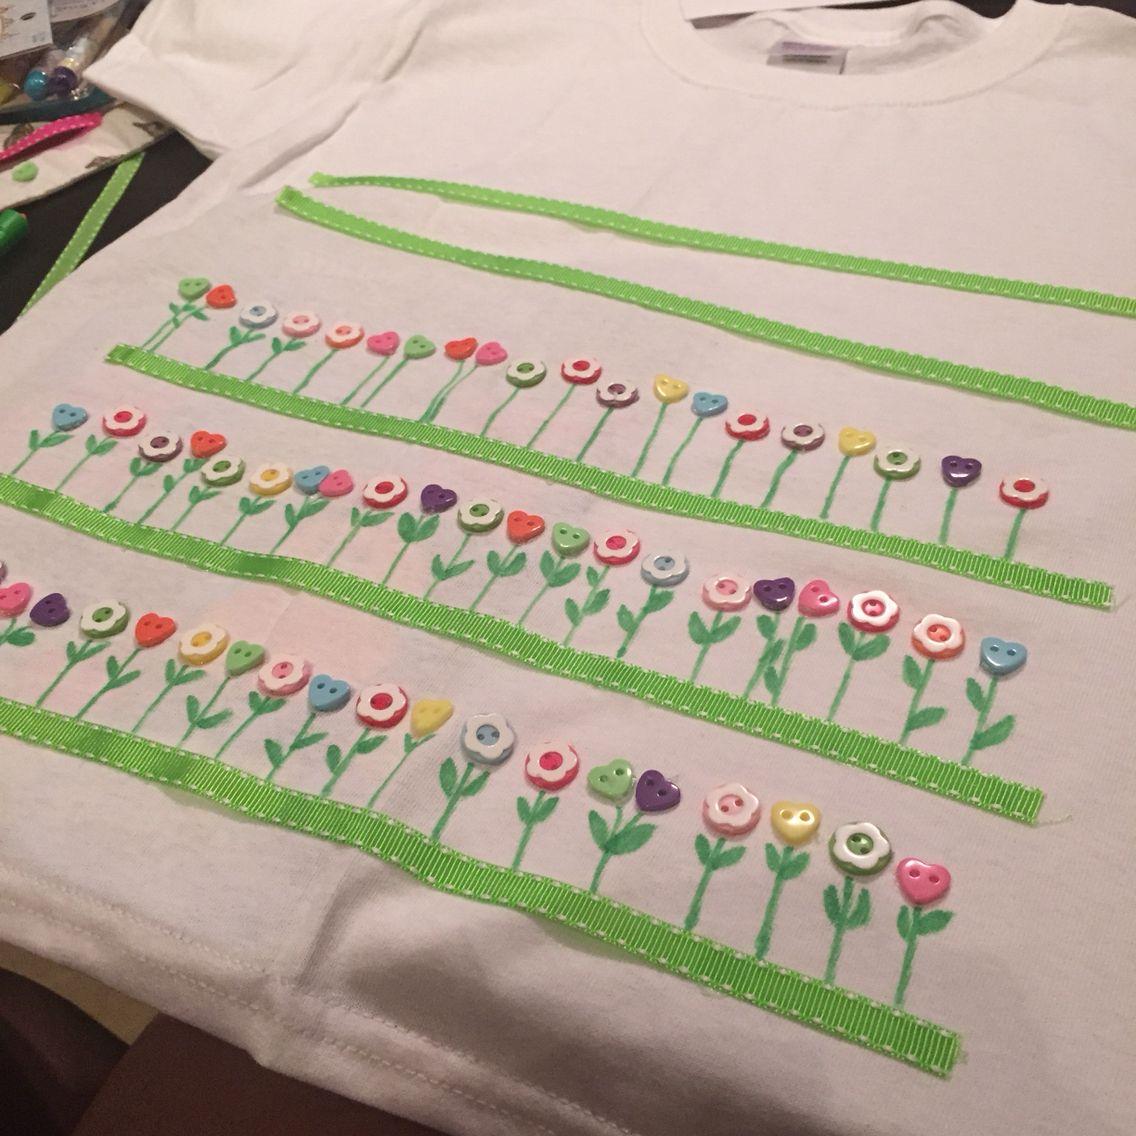 100 Days Of School T Shirt Easy Diy Idea Just Ribbons Bottons